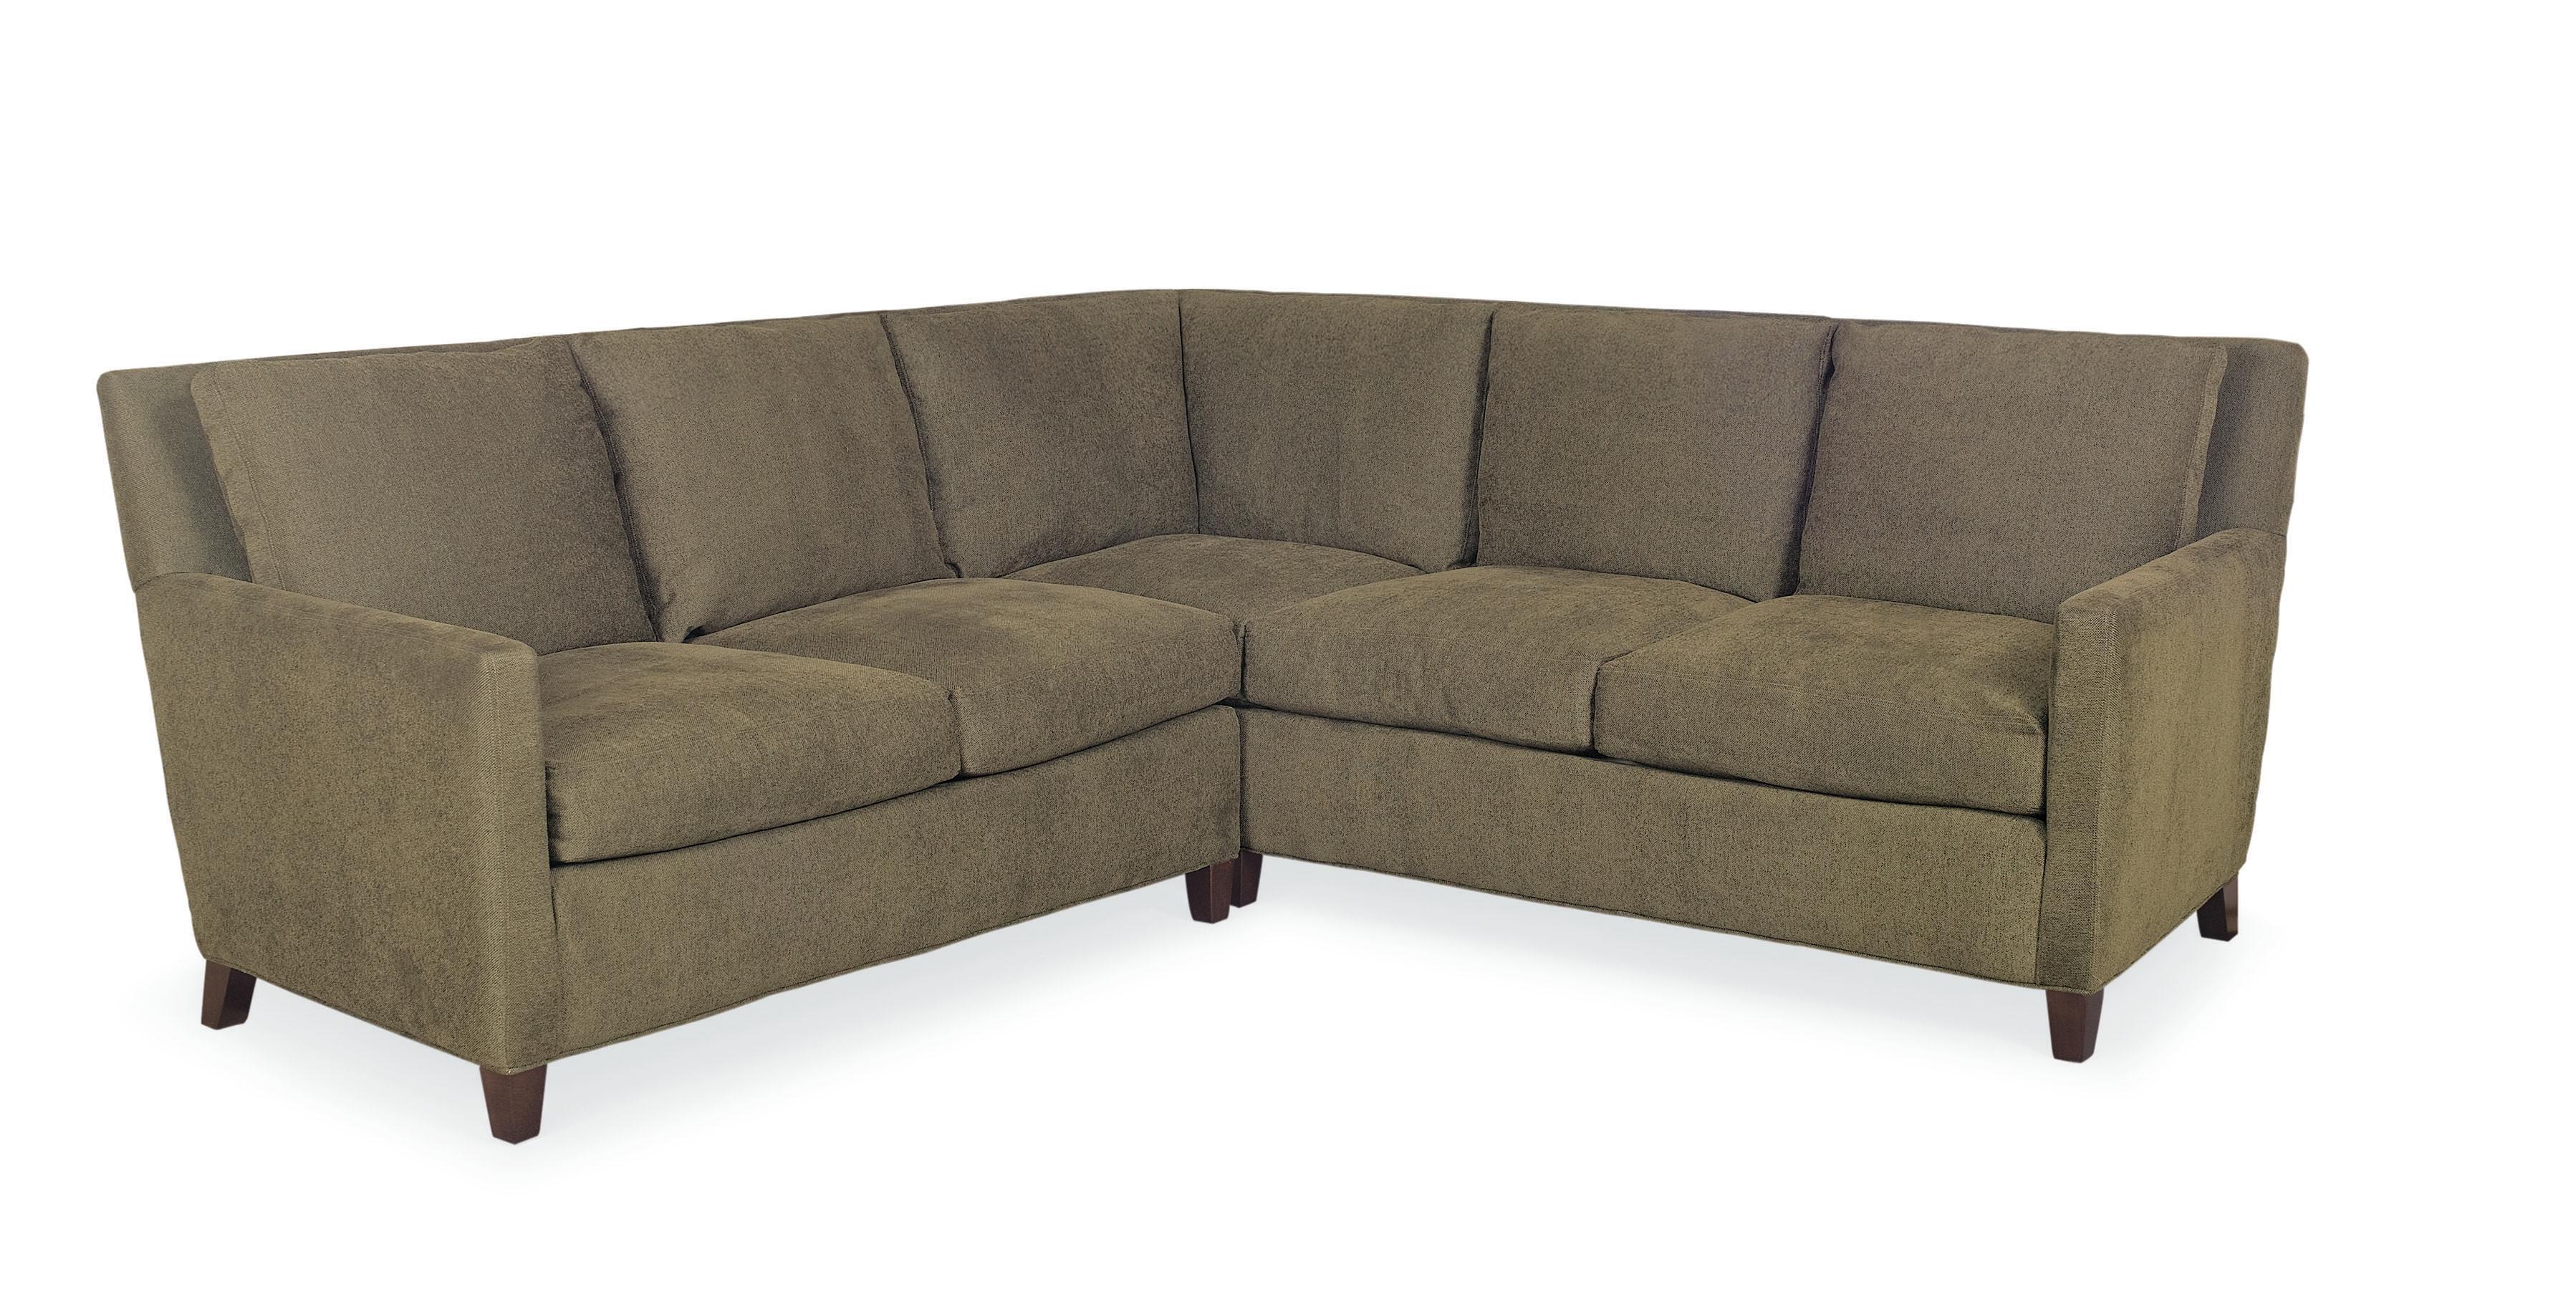 Mfrancesco in montclair nj 07042 for Abanos furniture industries decoration llc